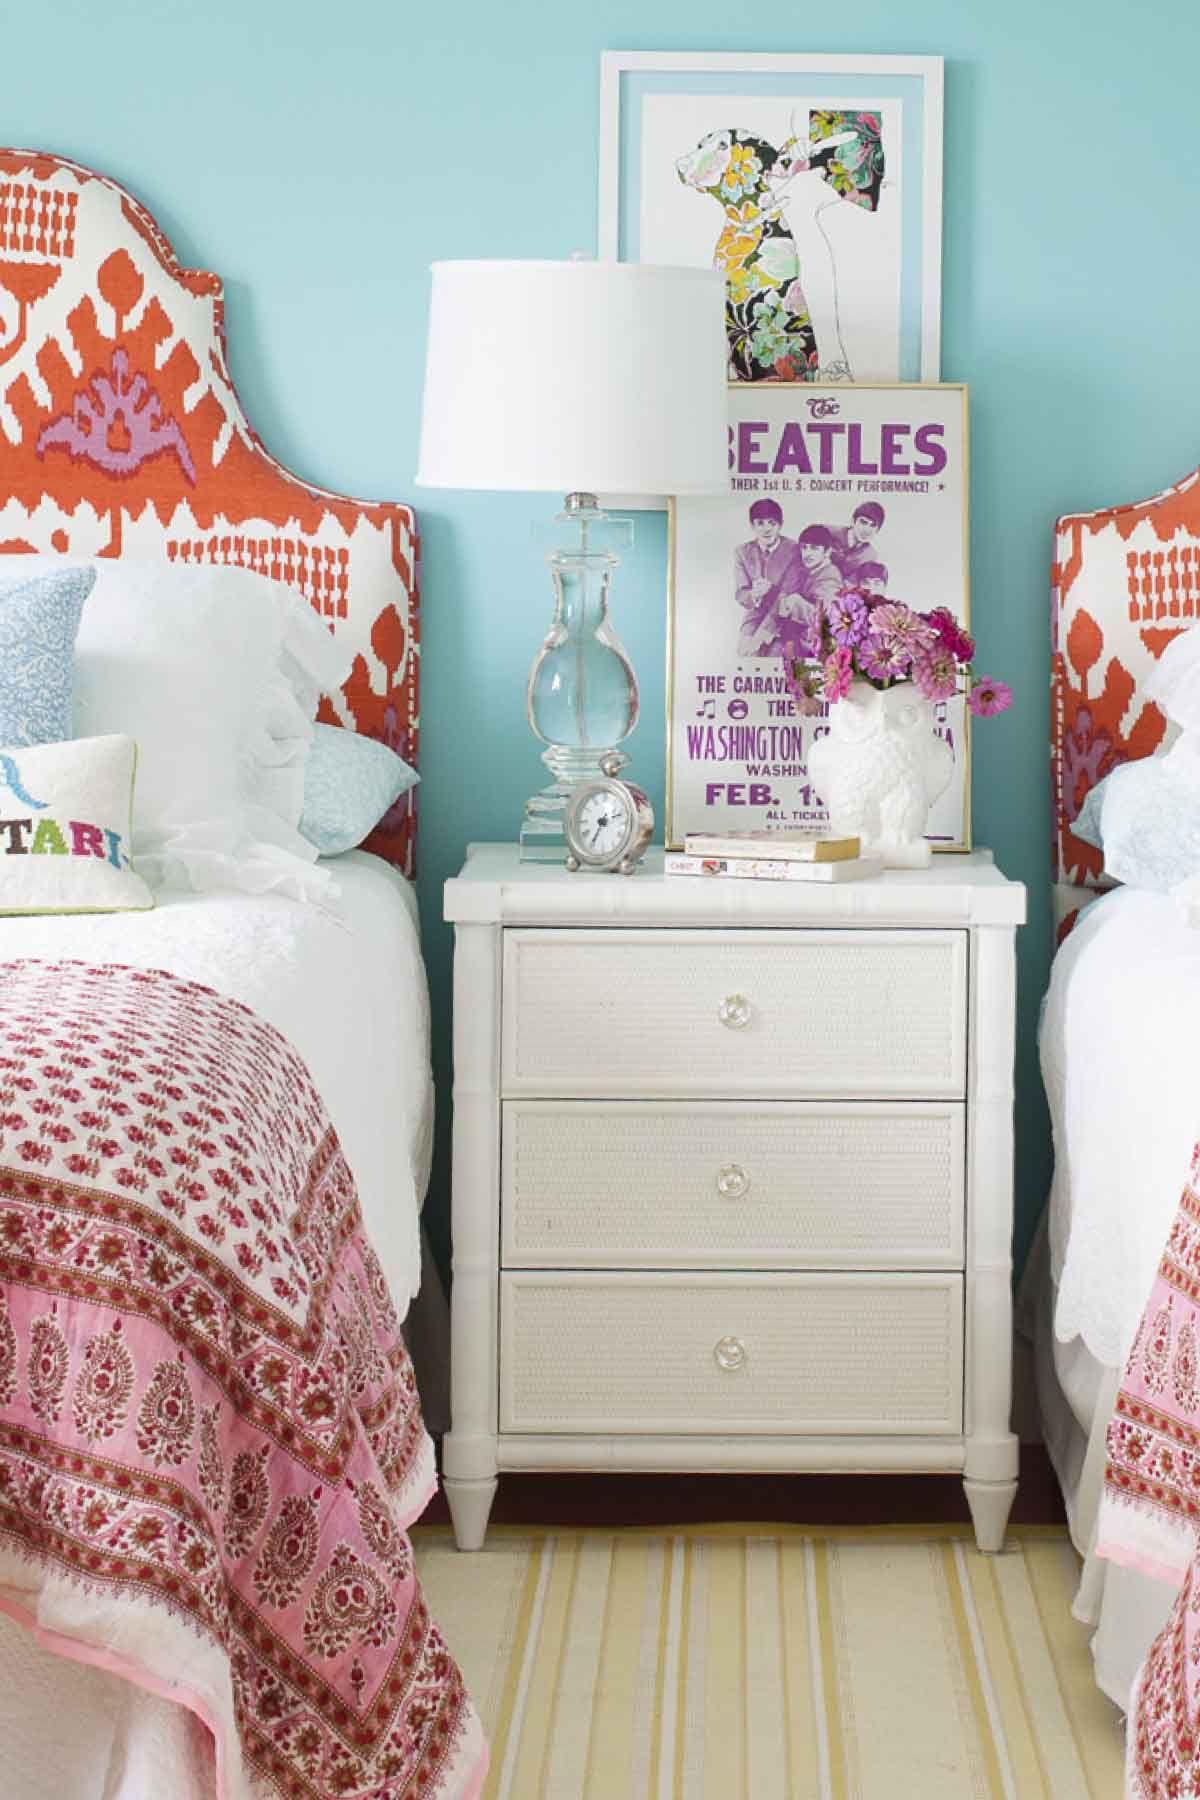 12 Fun Girl's Bedroom Decor Ideas - Cute Room Decorating ... on Girls Room Decoration  id=91635